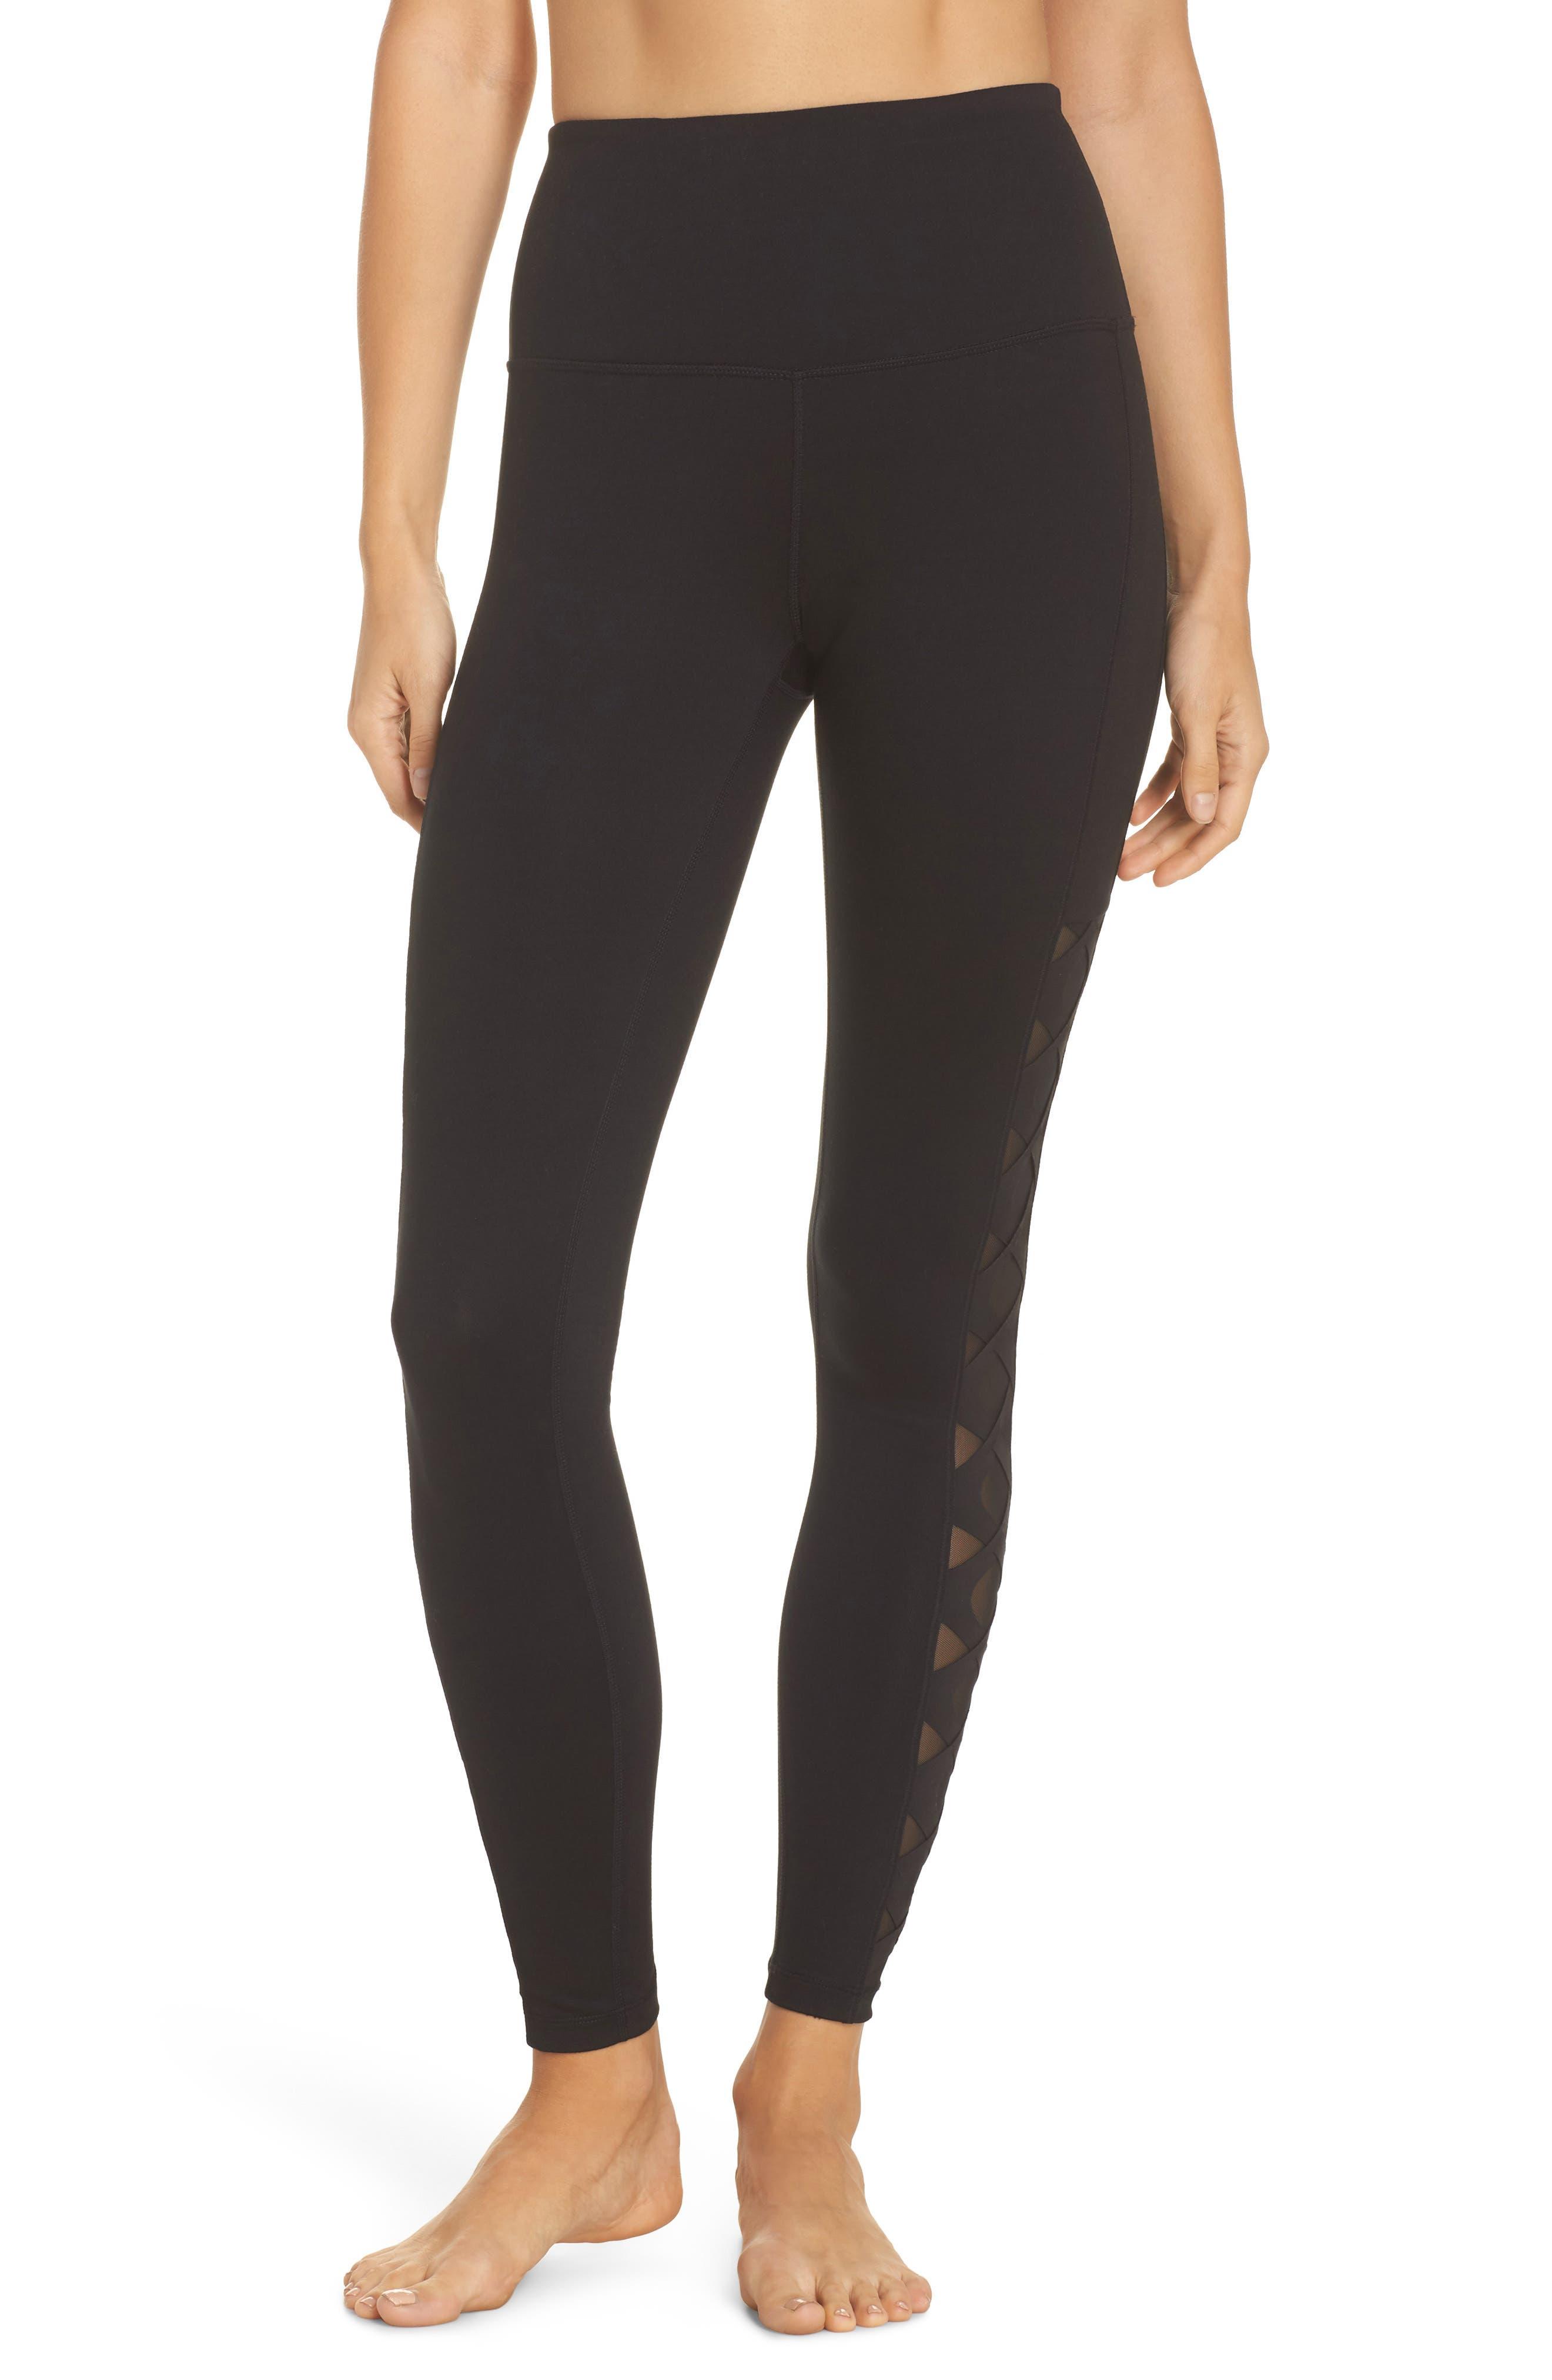 Laser Cut High Waist Leggings,                         Main,                         color, Black